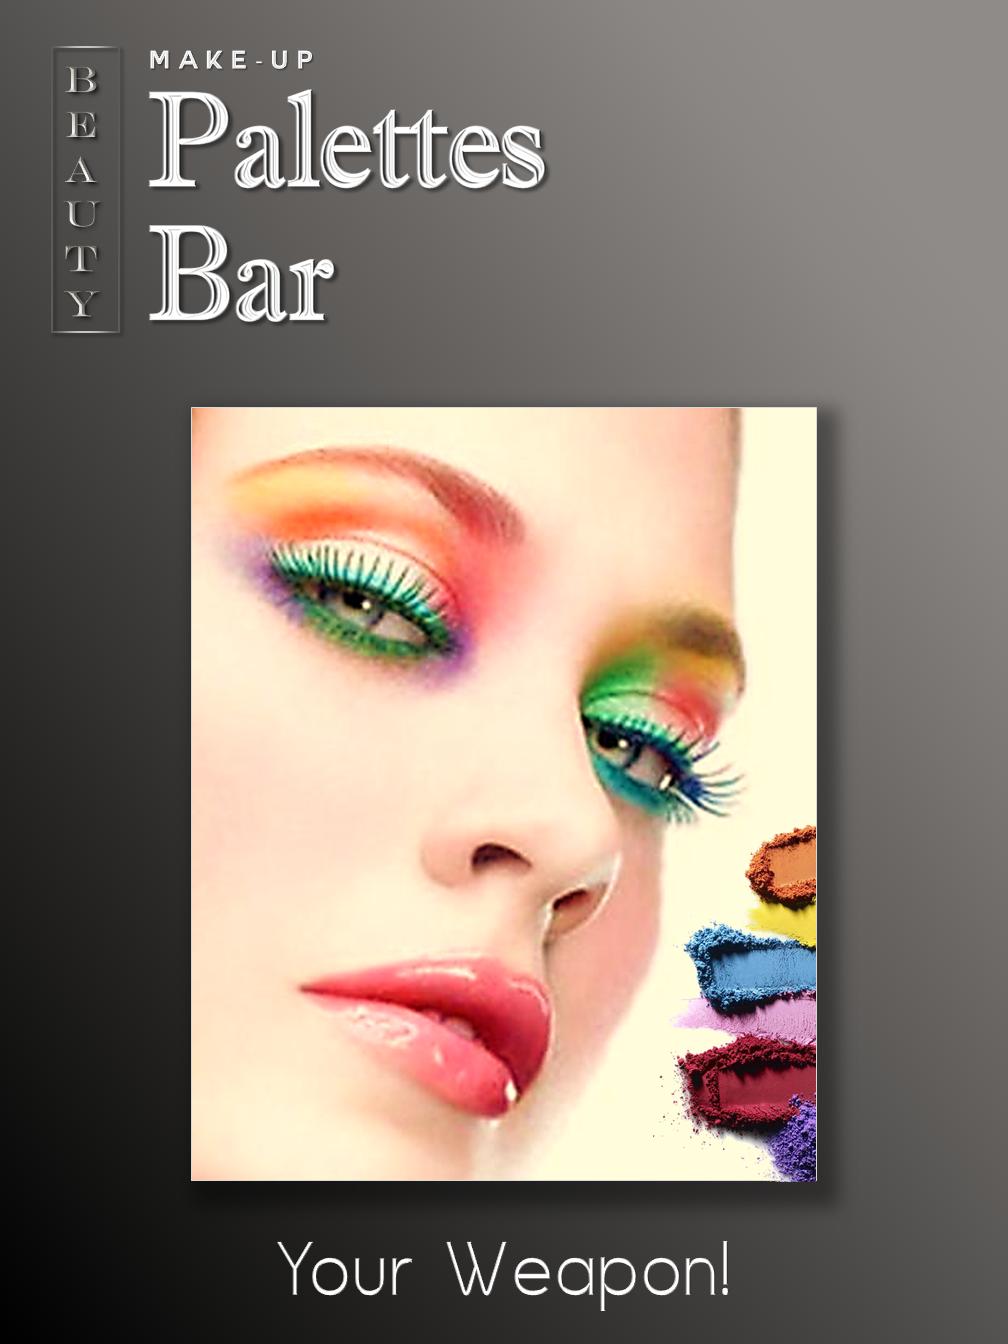 Palettes Bar